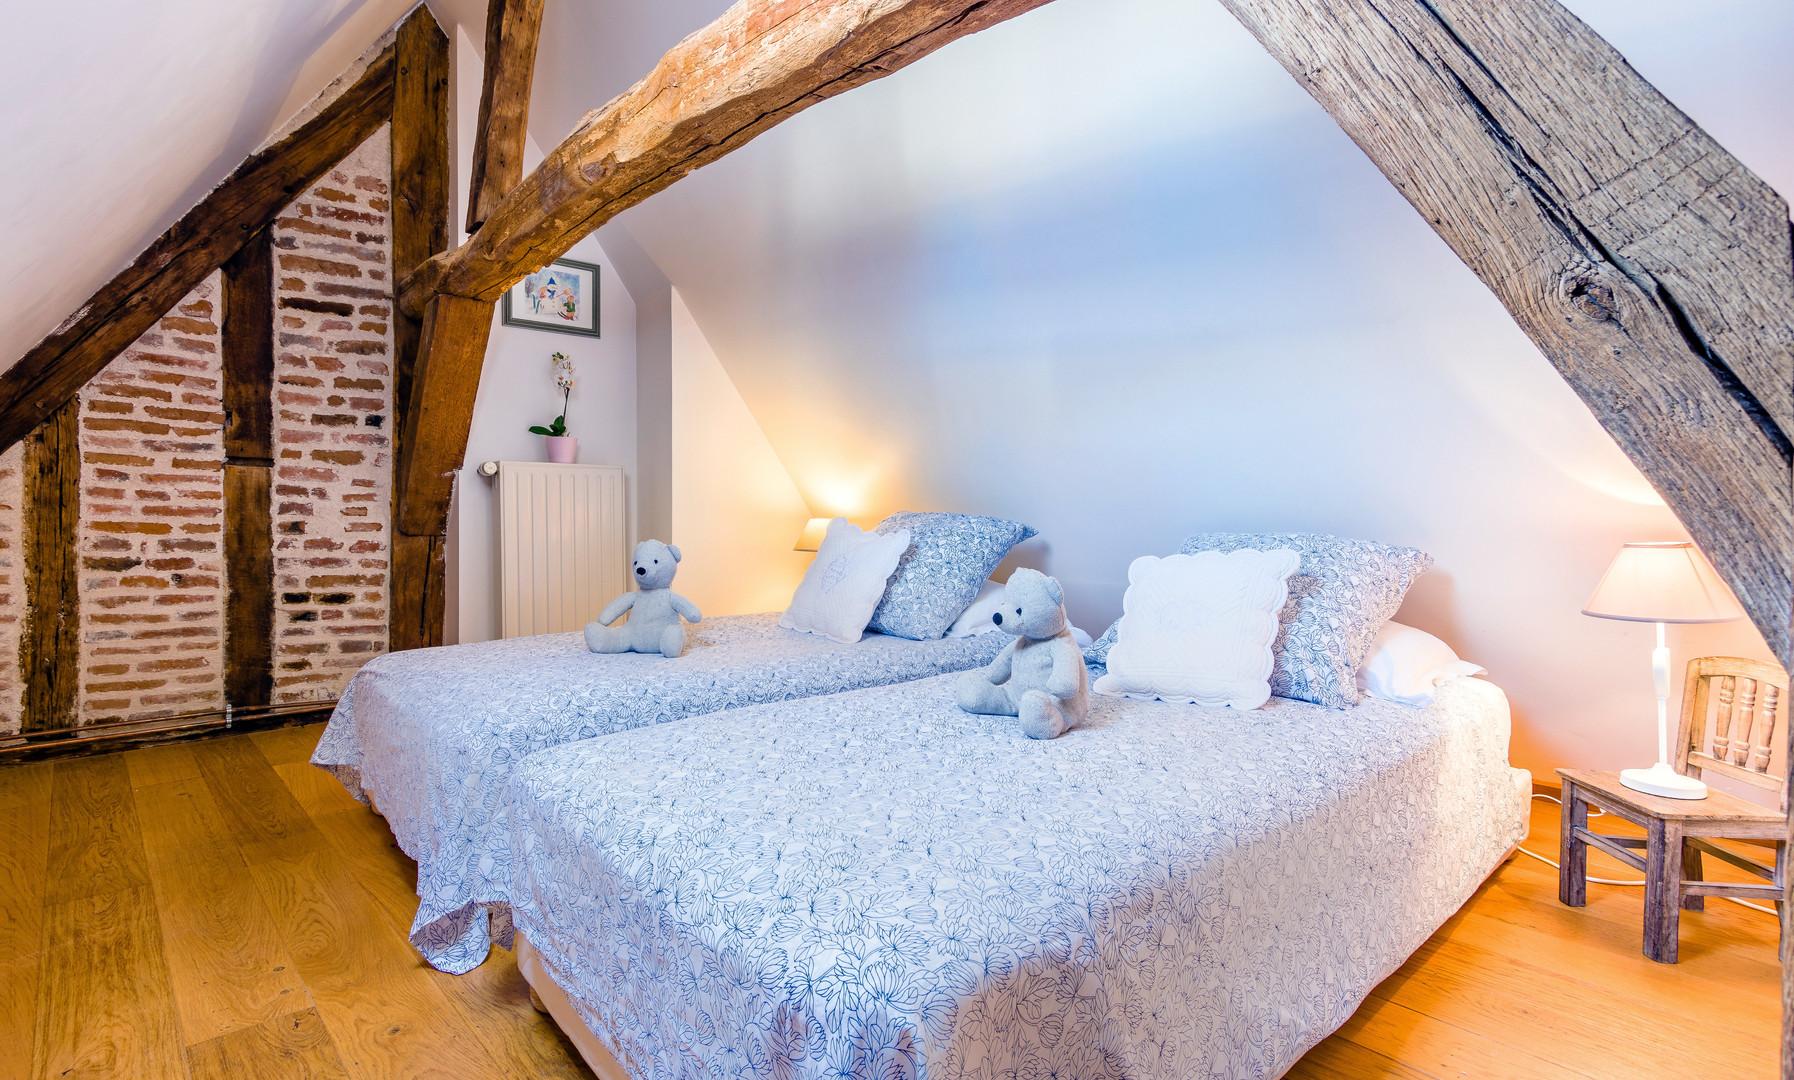 VillaConcorde-Chambord100718.jpg